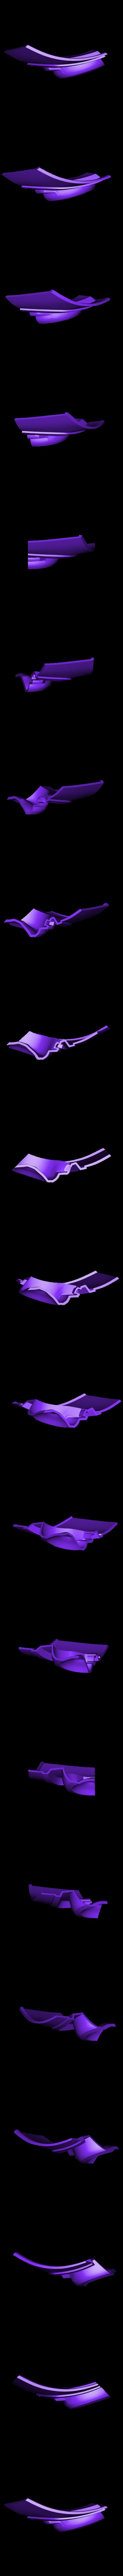 Part_11_v3.stl Download free STL file Blood Dragon Helmet Mass Effect 2 • Design to 3D print, VillainousPropShop